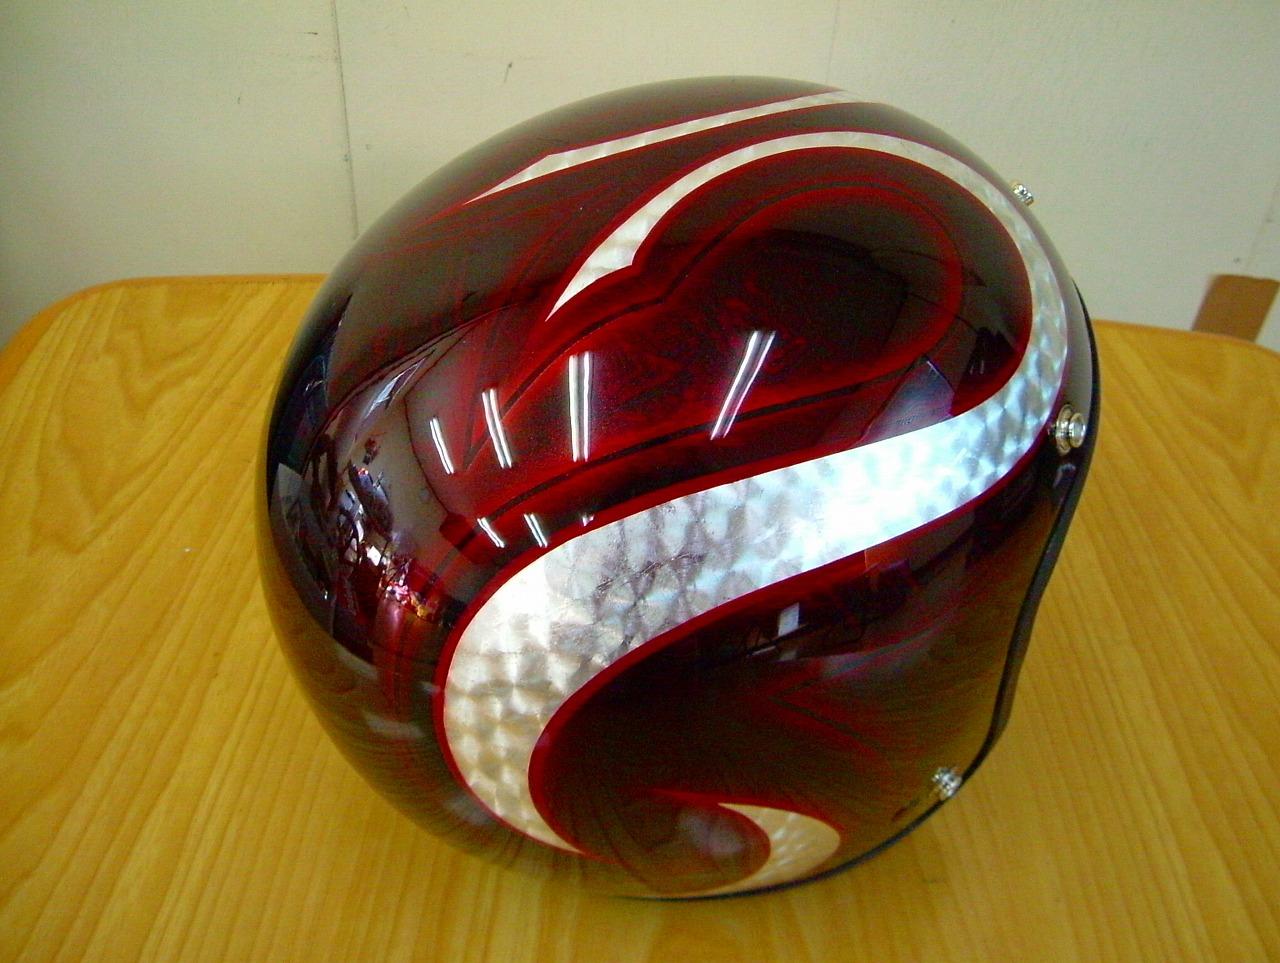 s-2003010108 (6)